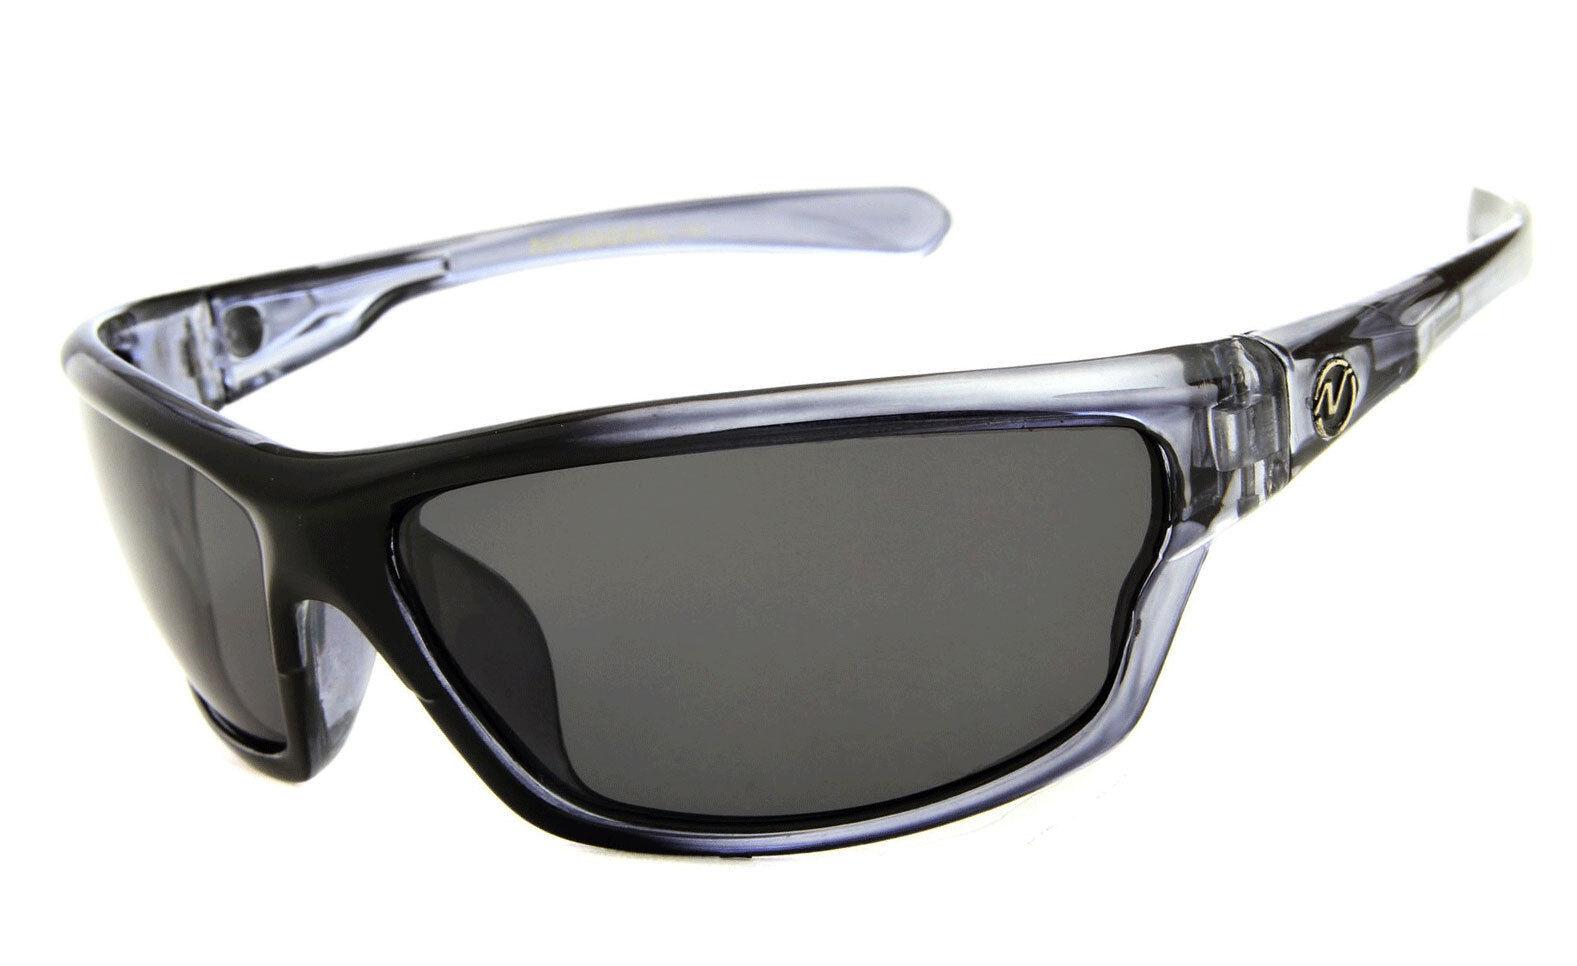 Envolventes Uv Sol Nitrogen Gafas De Para Hombre Polarizados 8OPkXNwn0